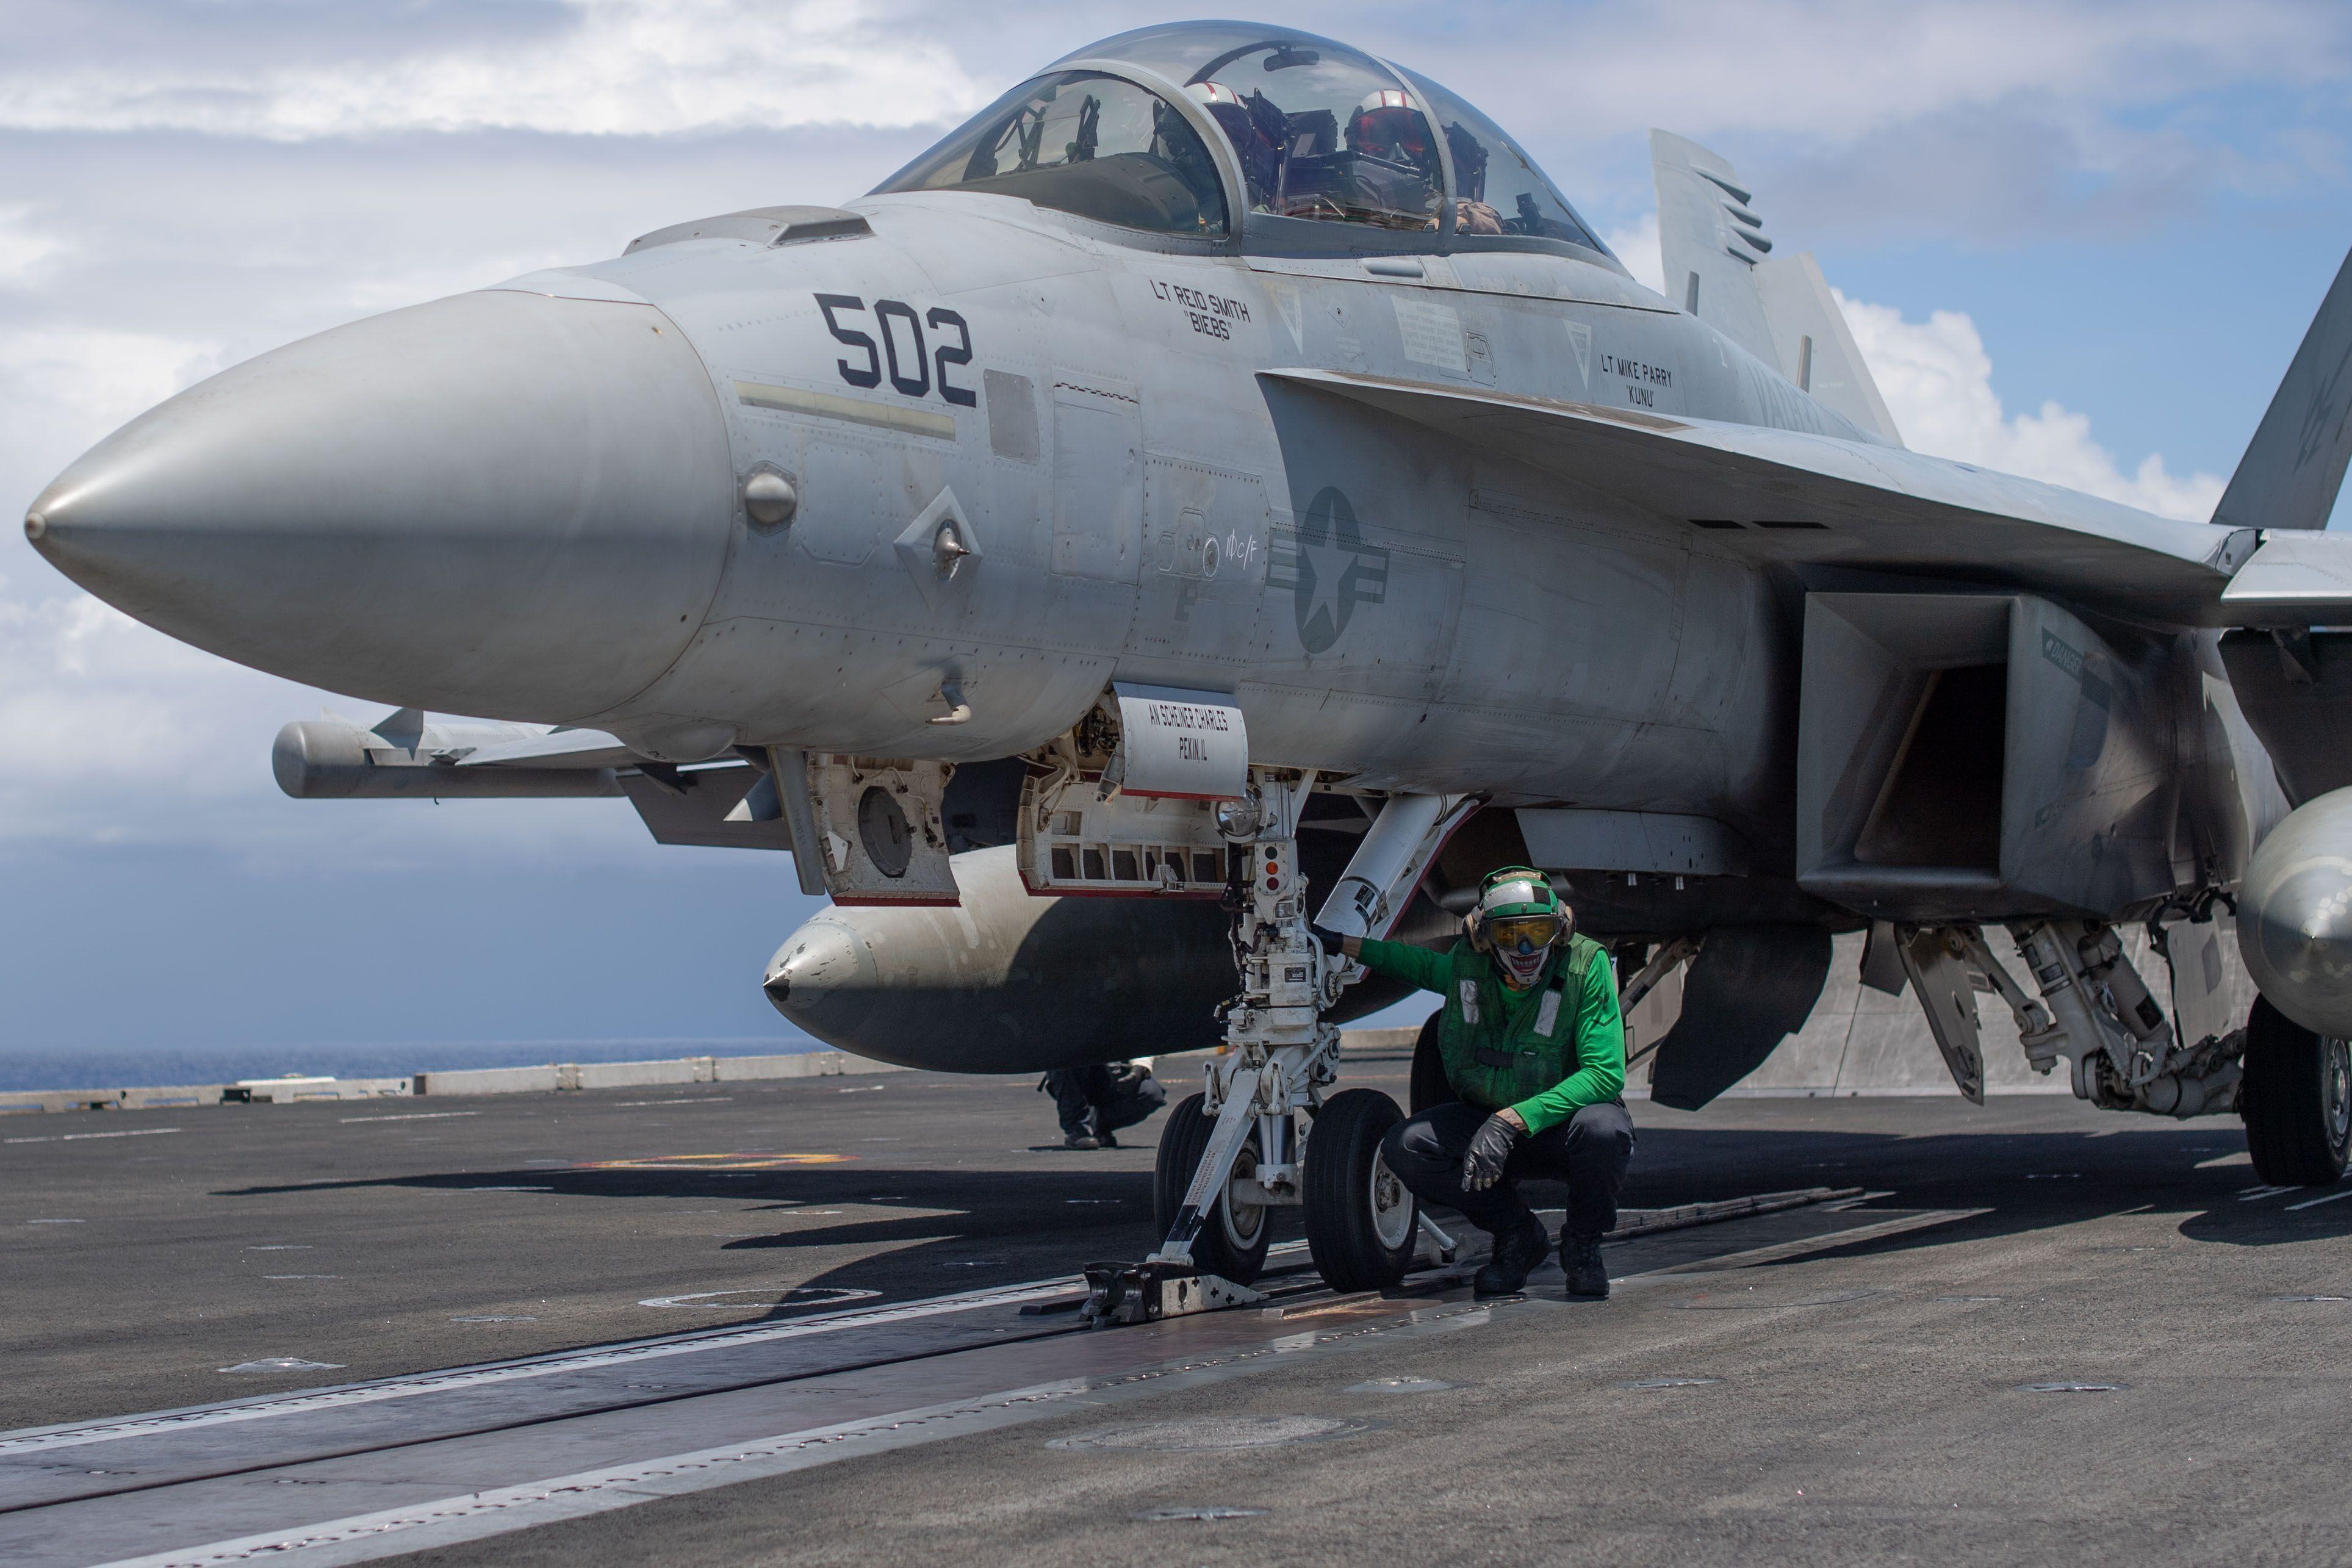 INDIAN OCEAN (Jan  28, 2019) Aviation Boatswain's Mate